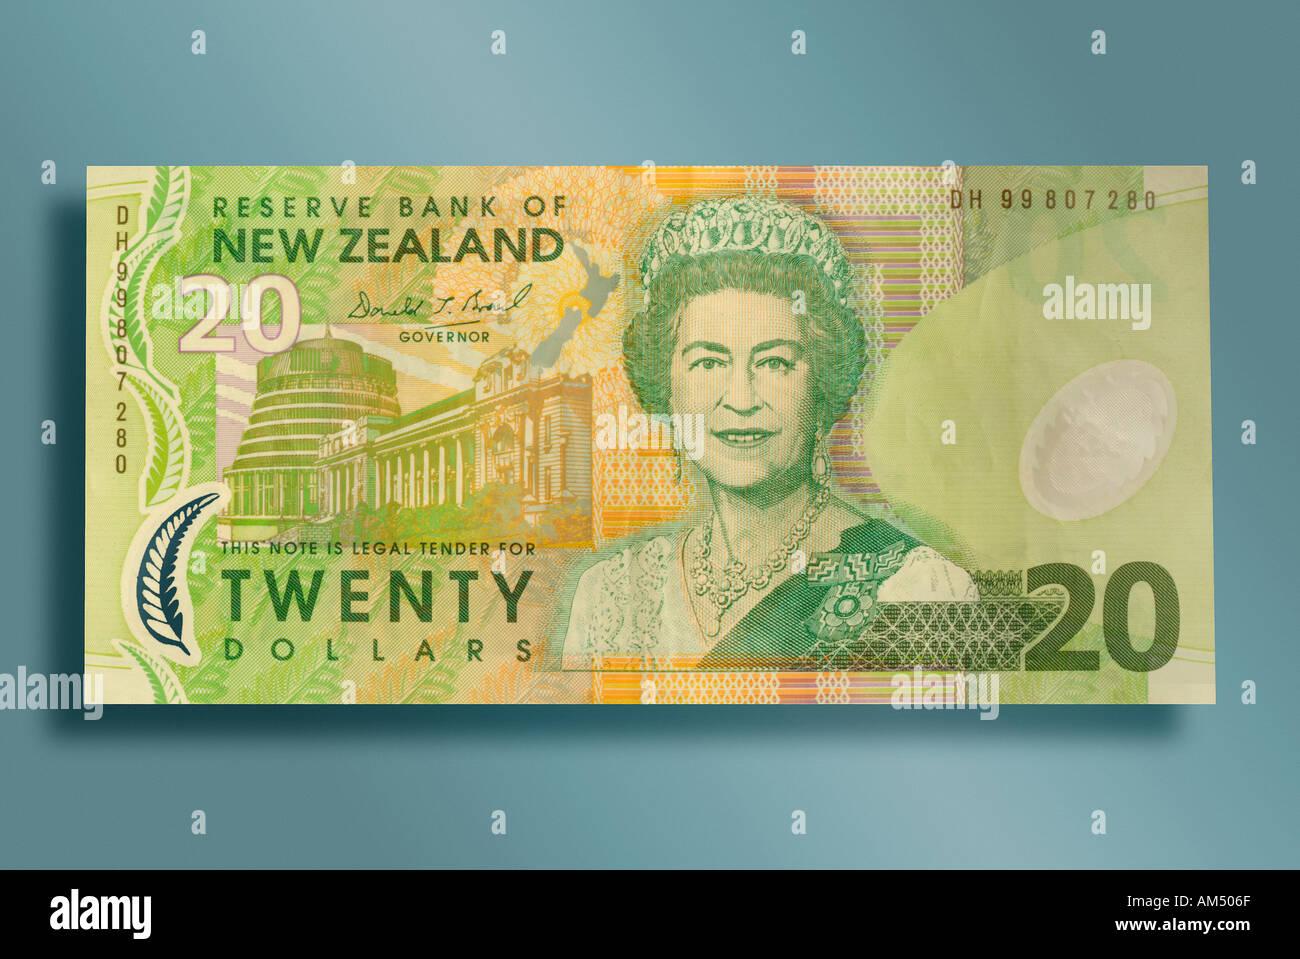 20 Dollarschein aus Neuseeland Stockfoto, Bild: 1331310 - Alamy